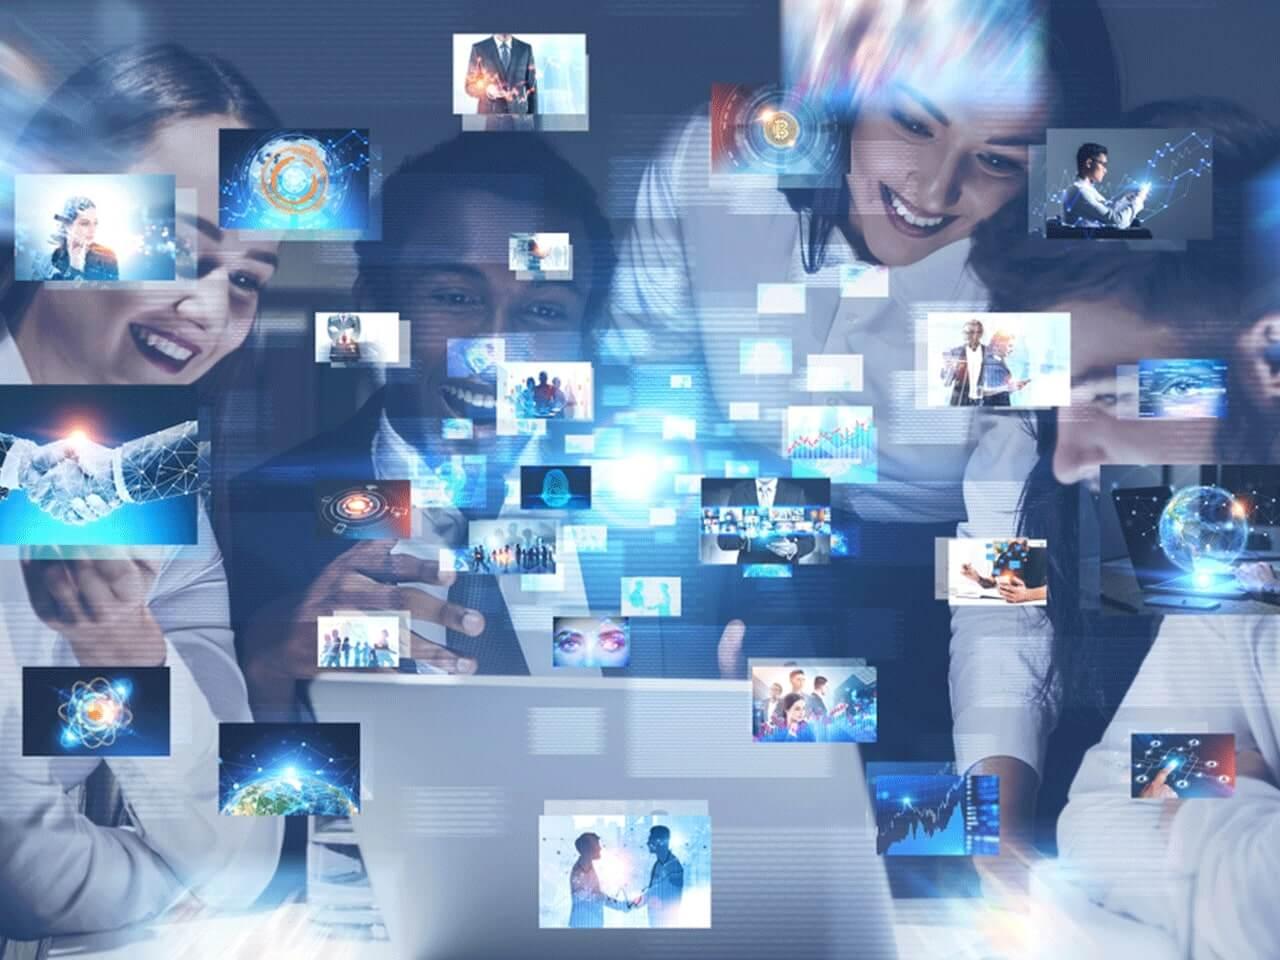 Custom Media and Entertainment Software: Media and Entertainment Software Development Services, media industry software, entertainment software development.